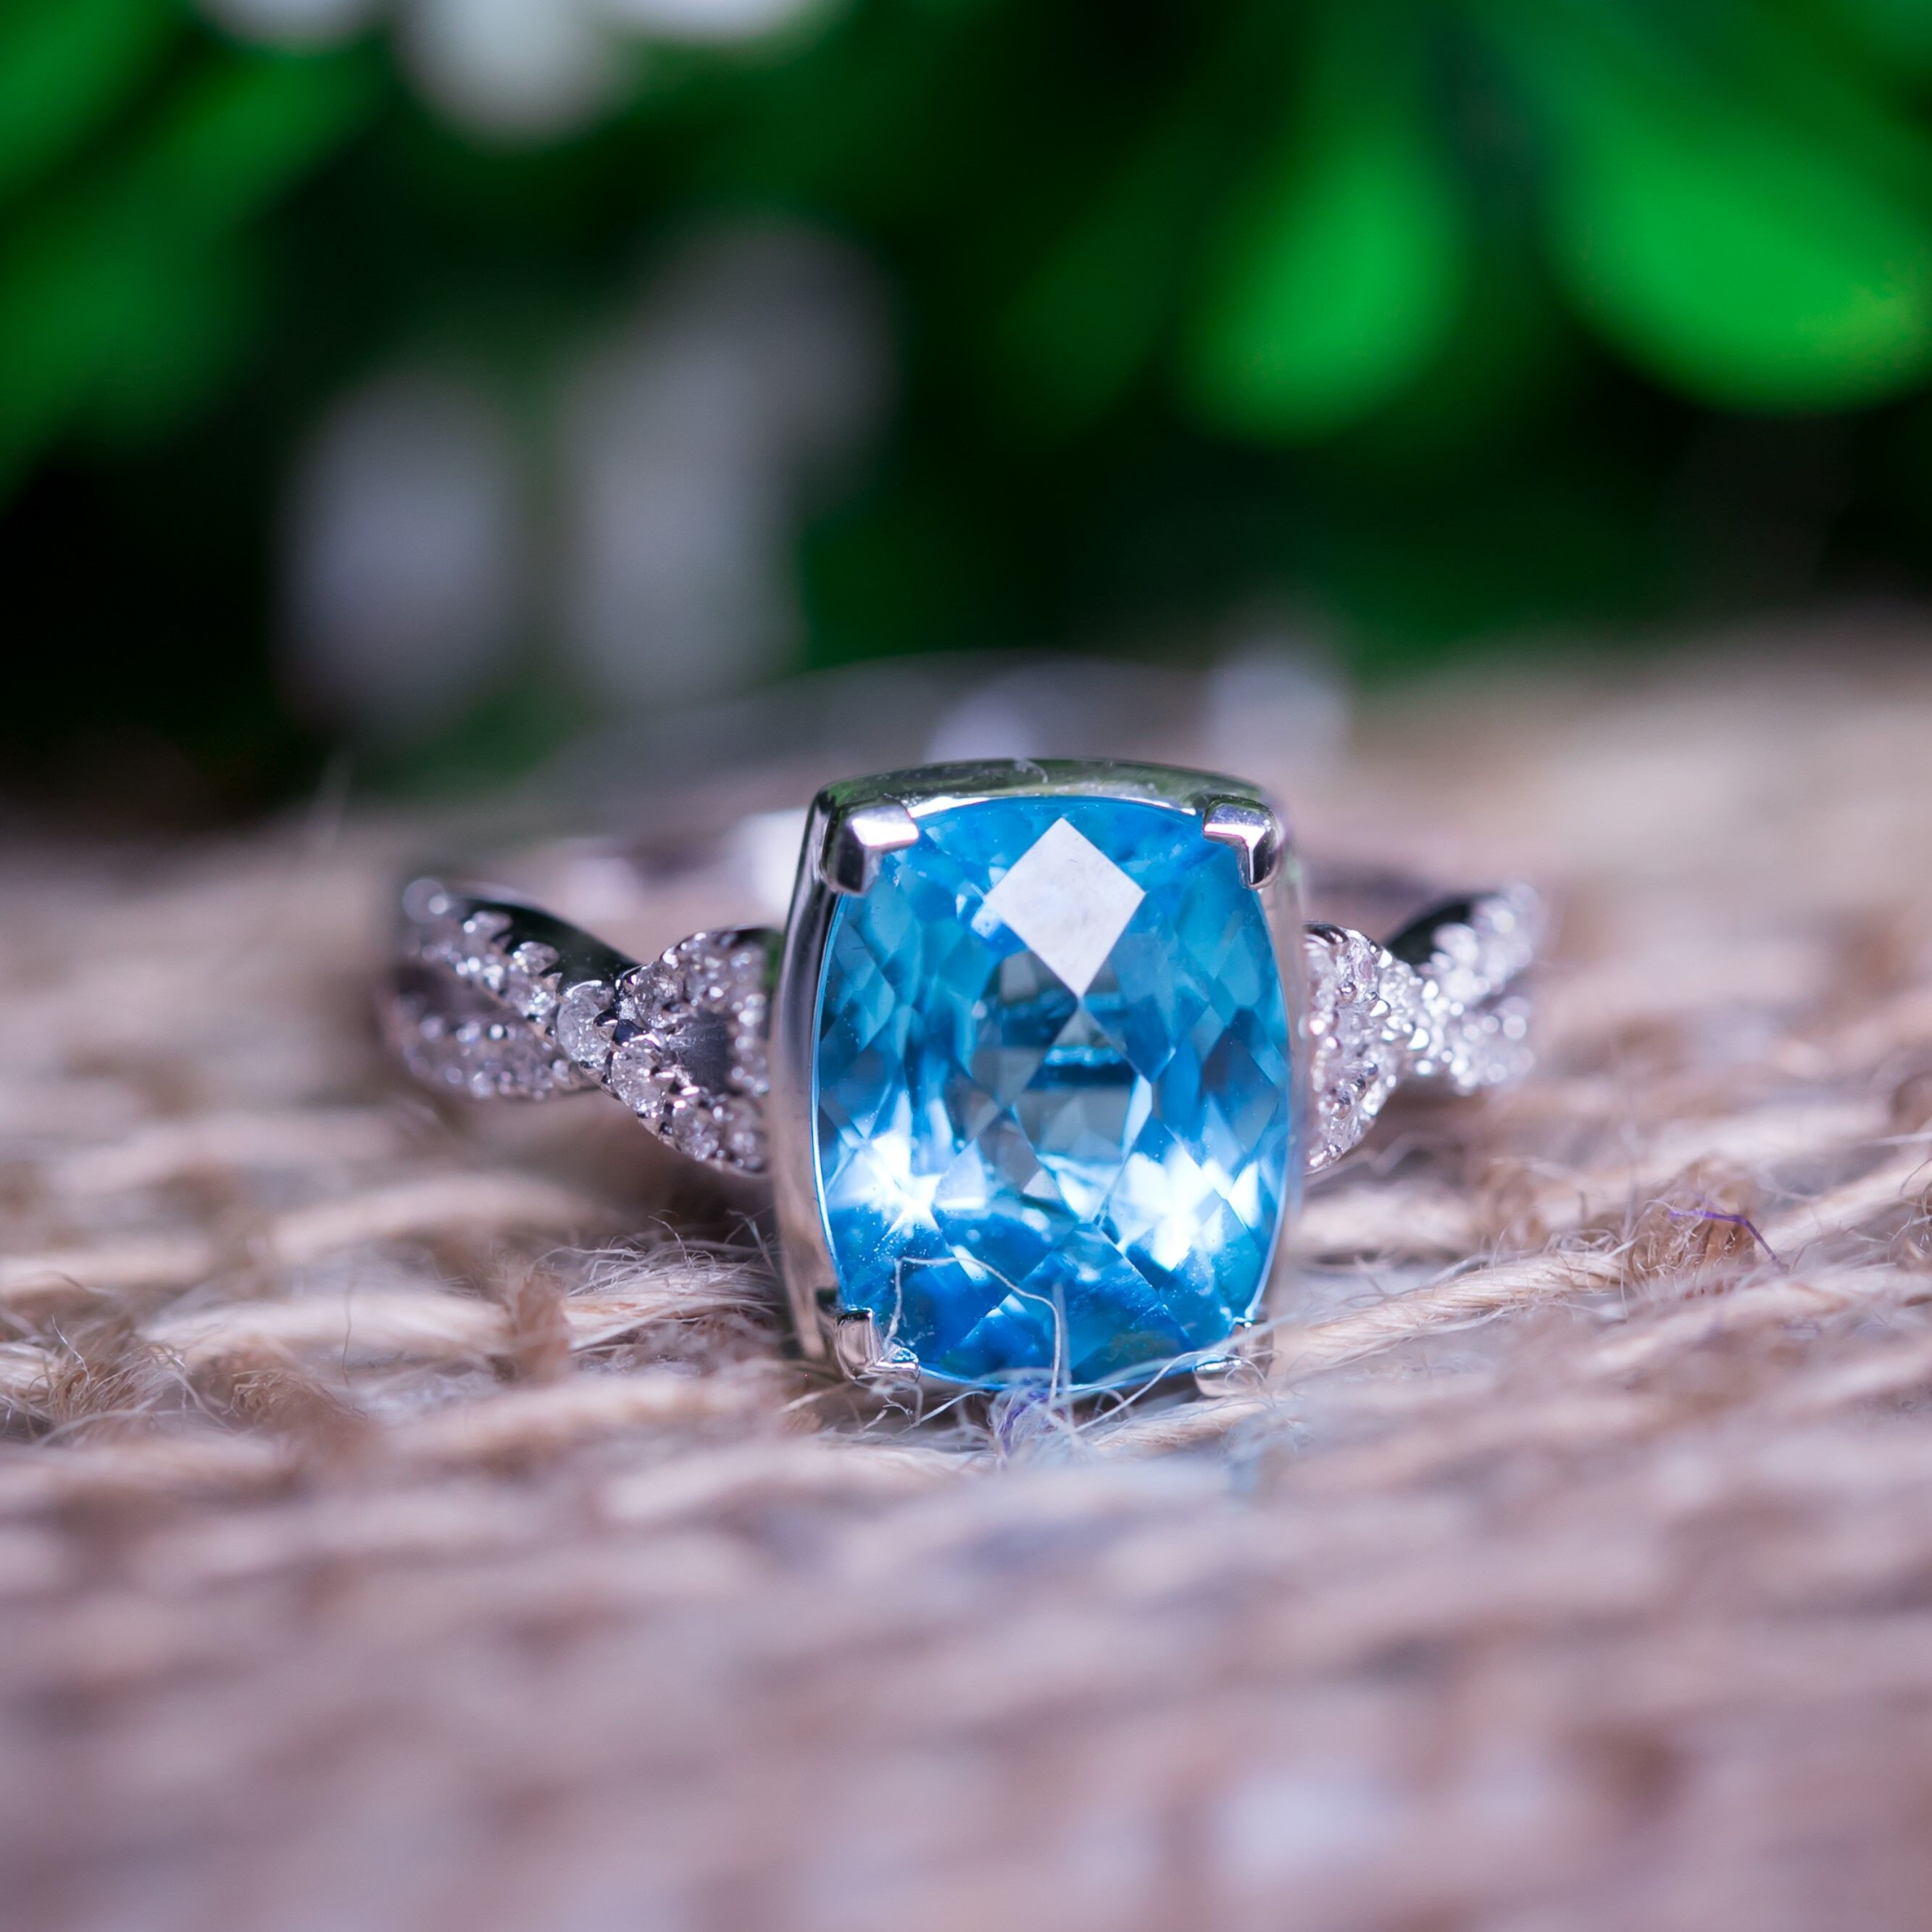 The Beautiful Blue December Stone: Blue Topaz